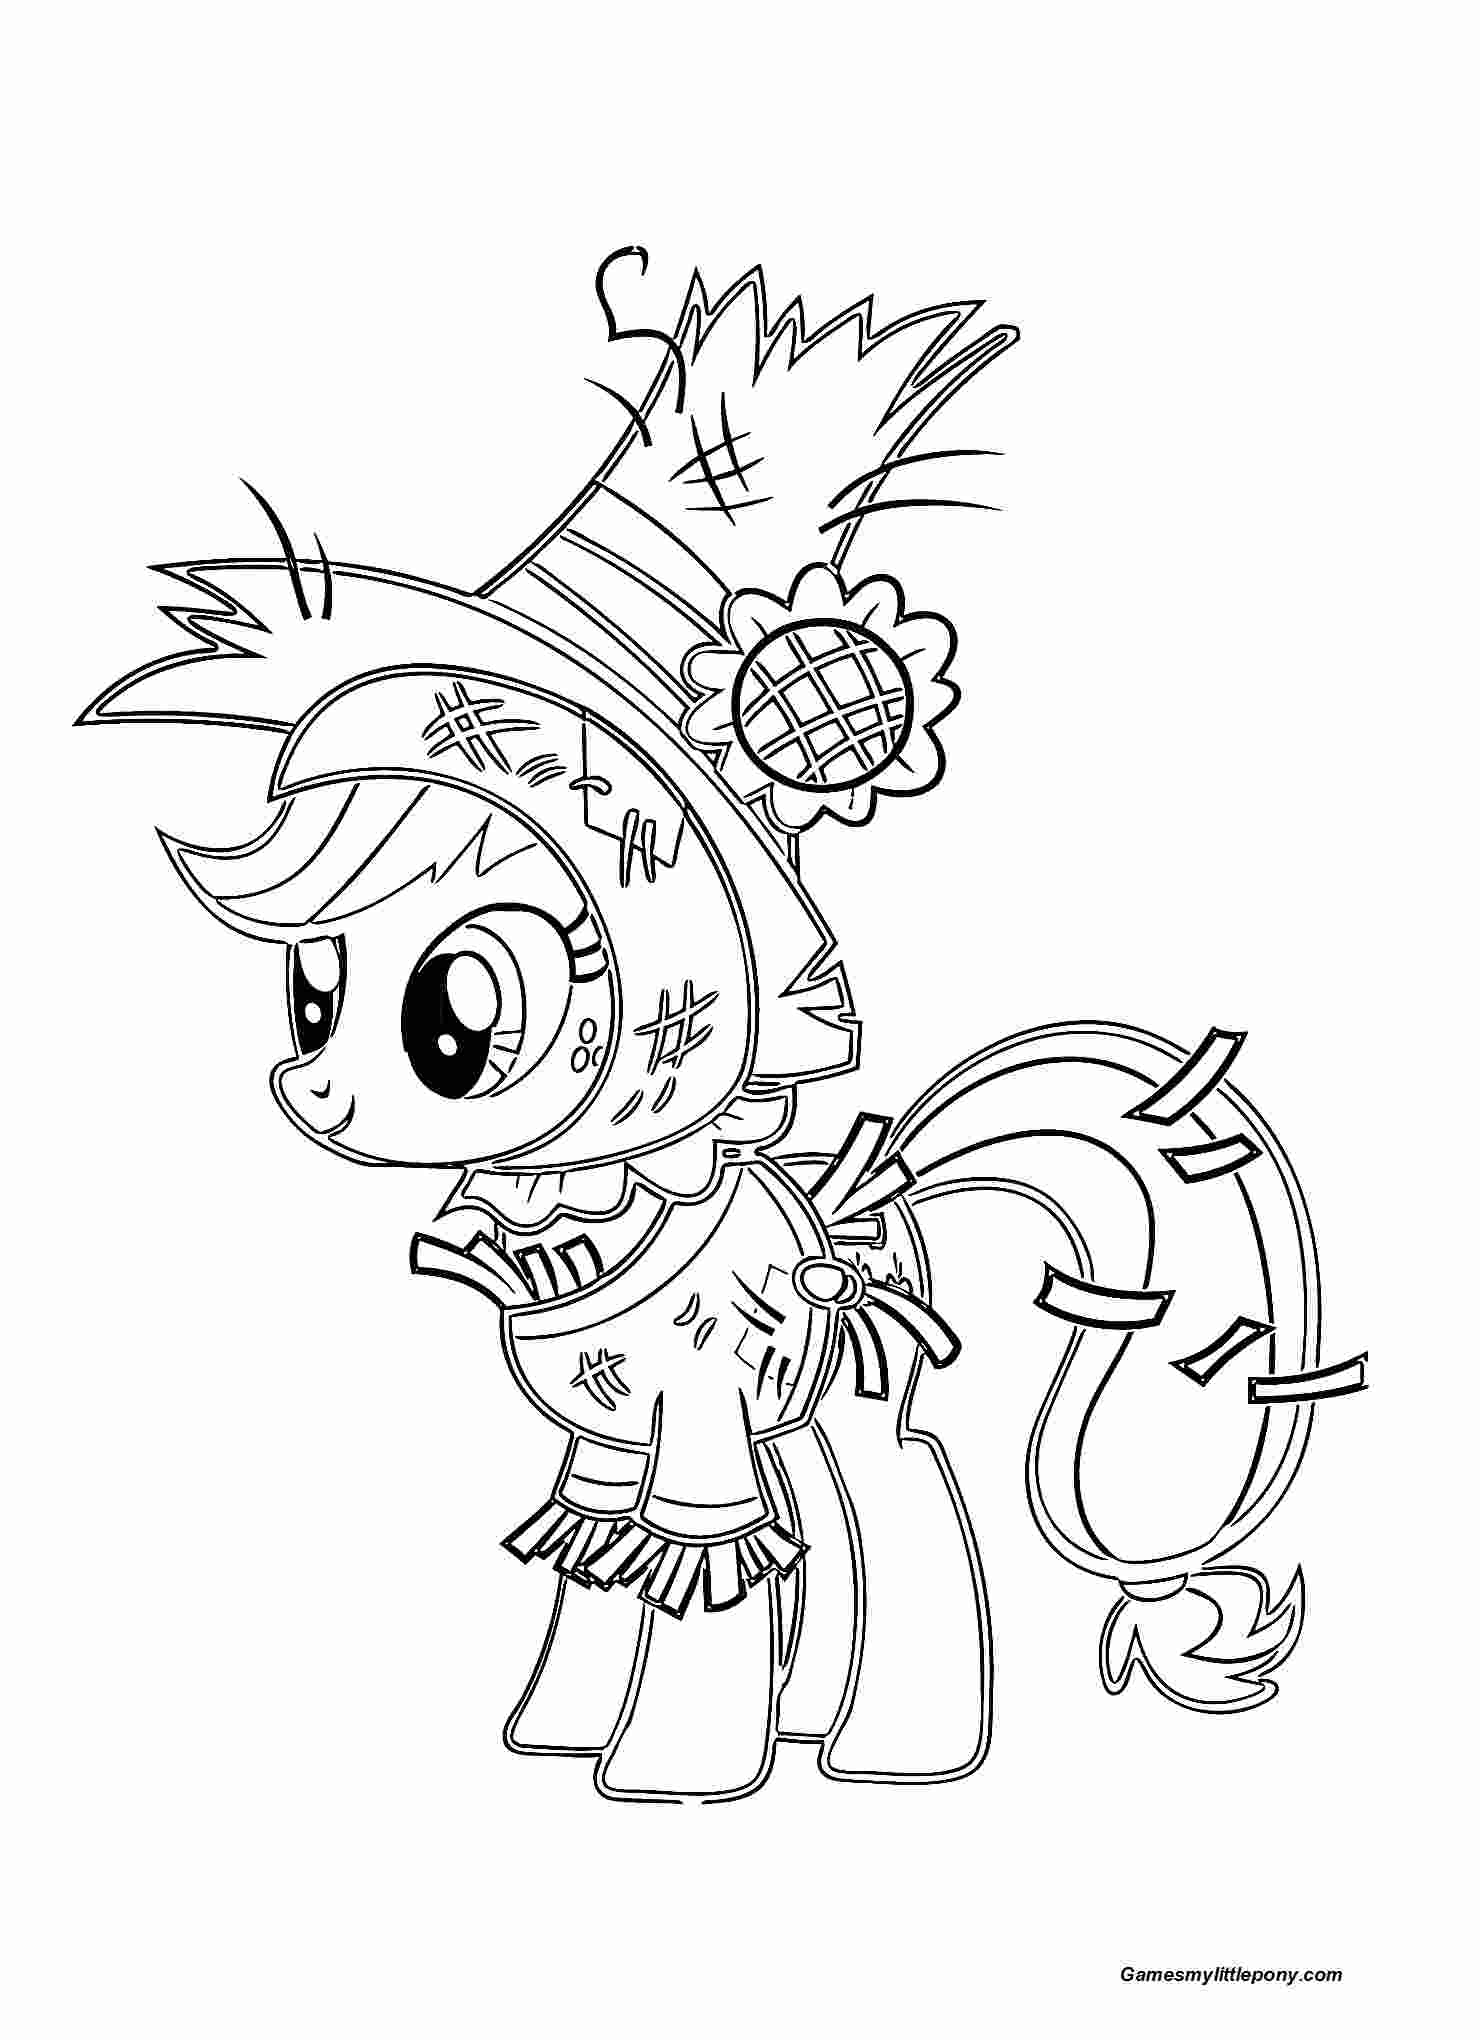 Funny Applejack Pony Halloween